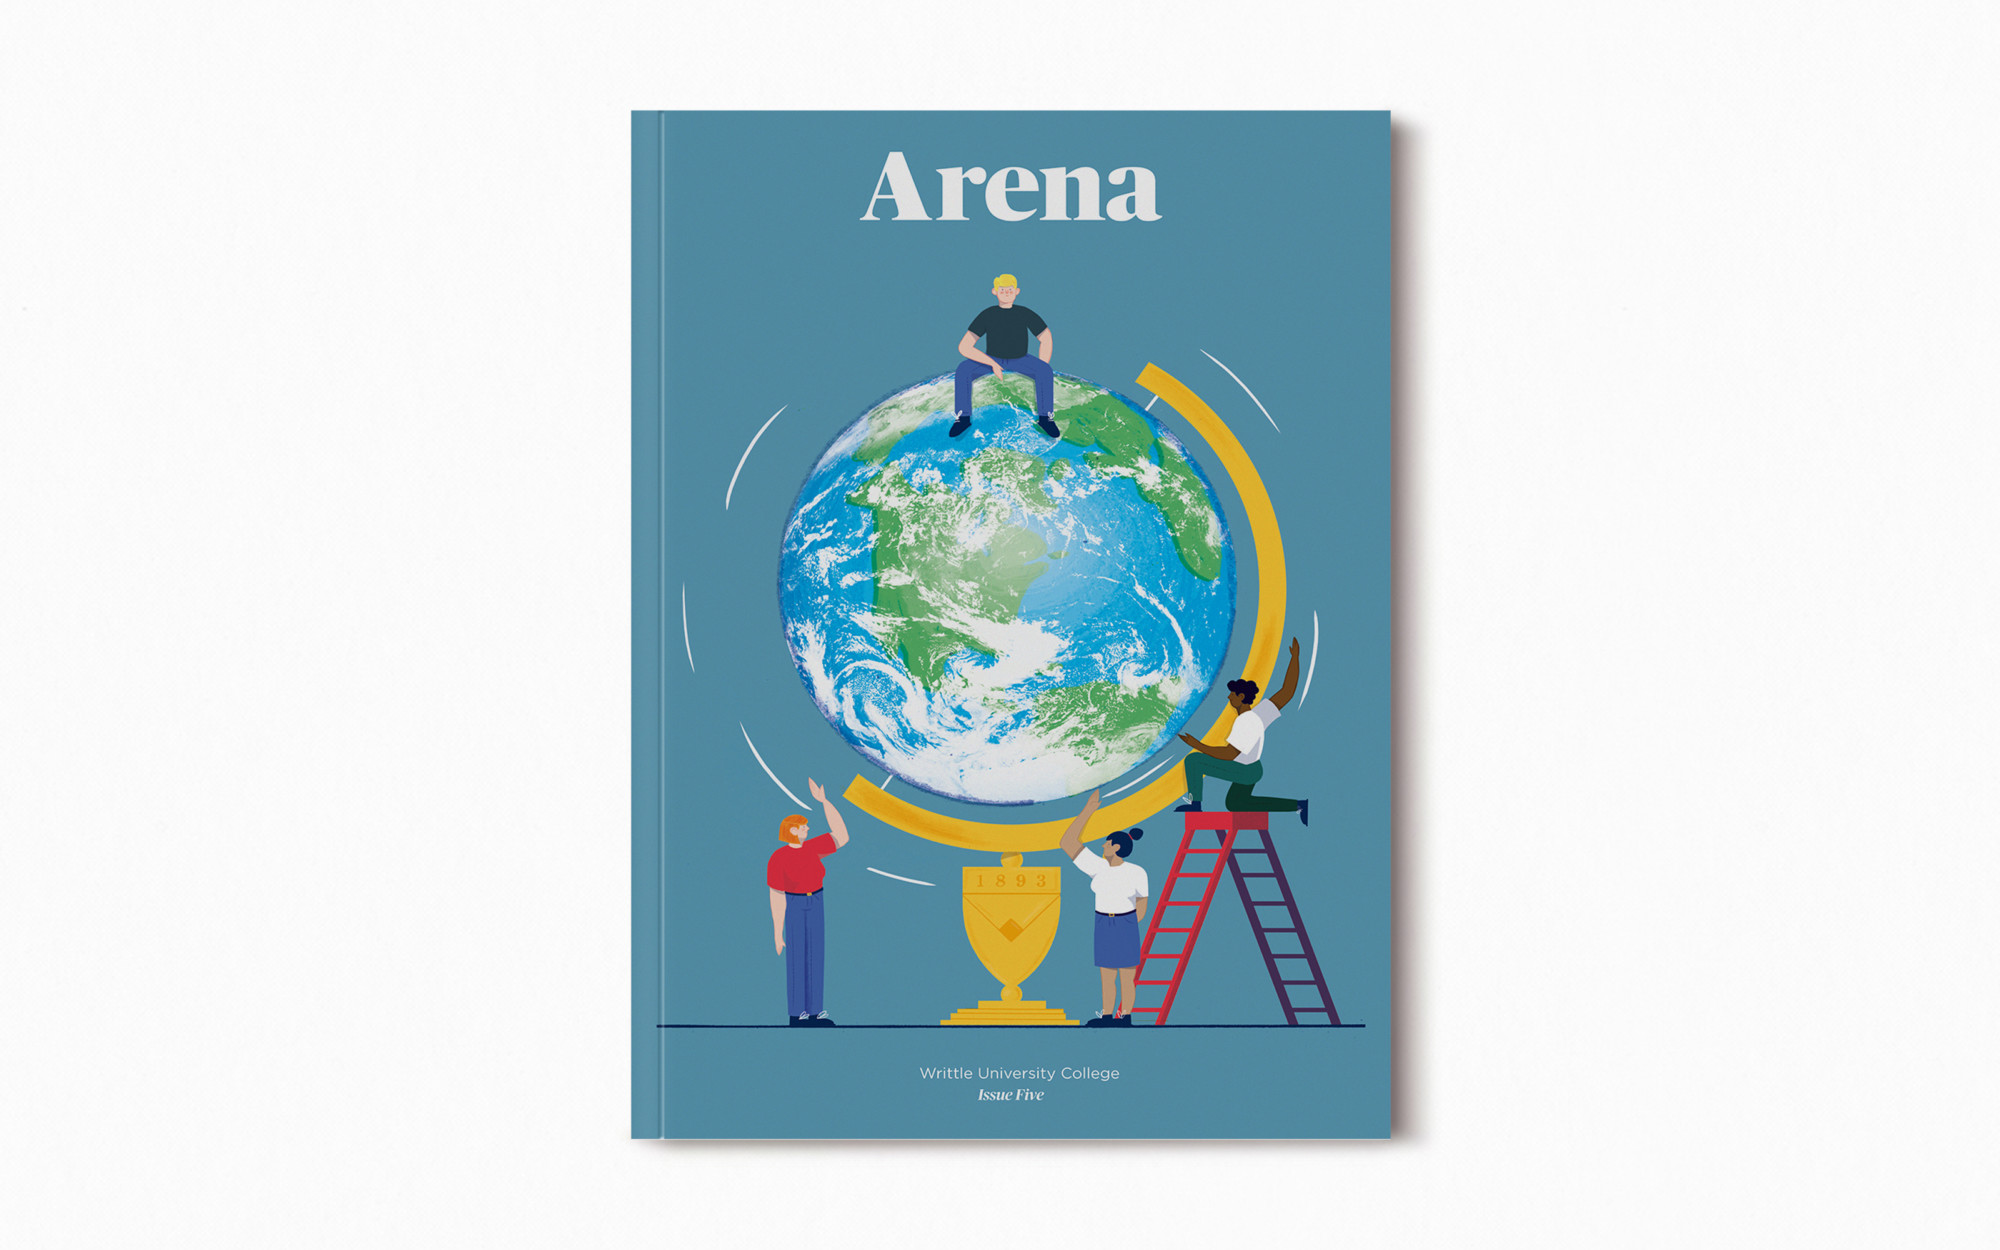 Writtle_Arena_Cover3.jpg